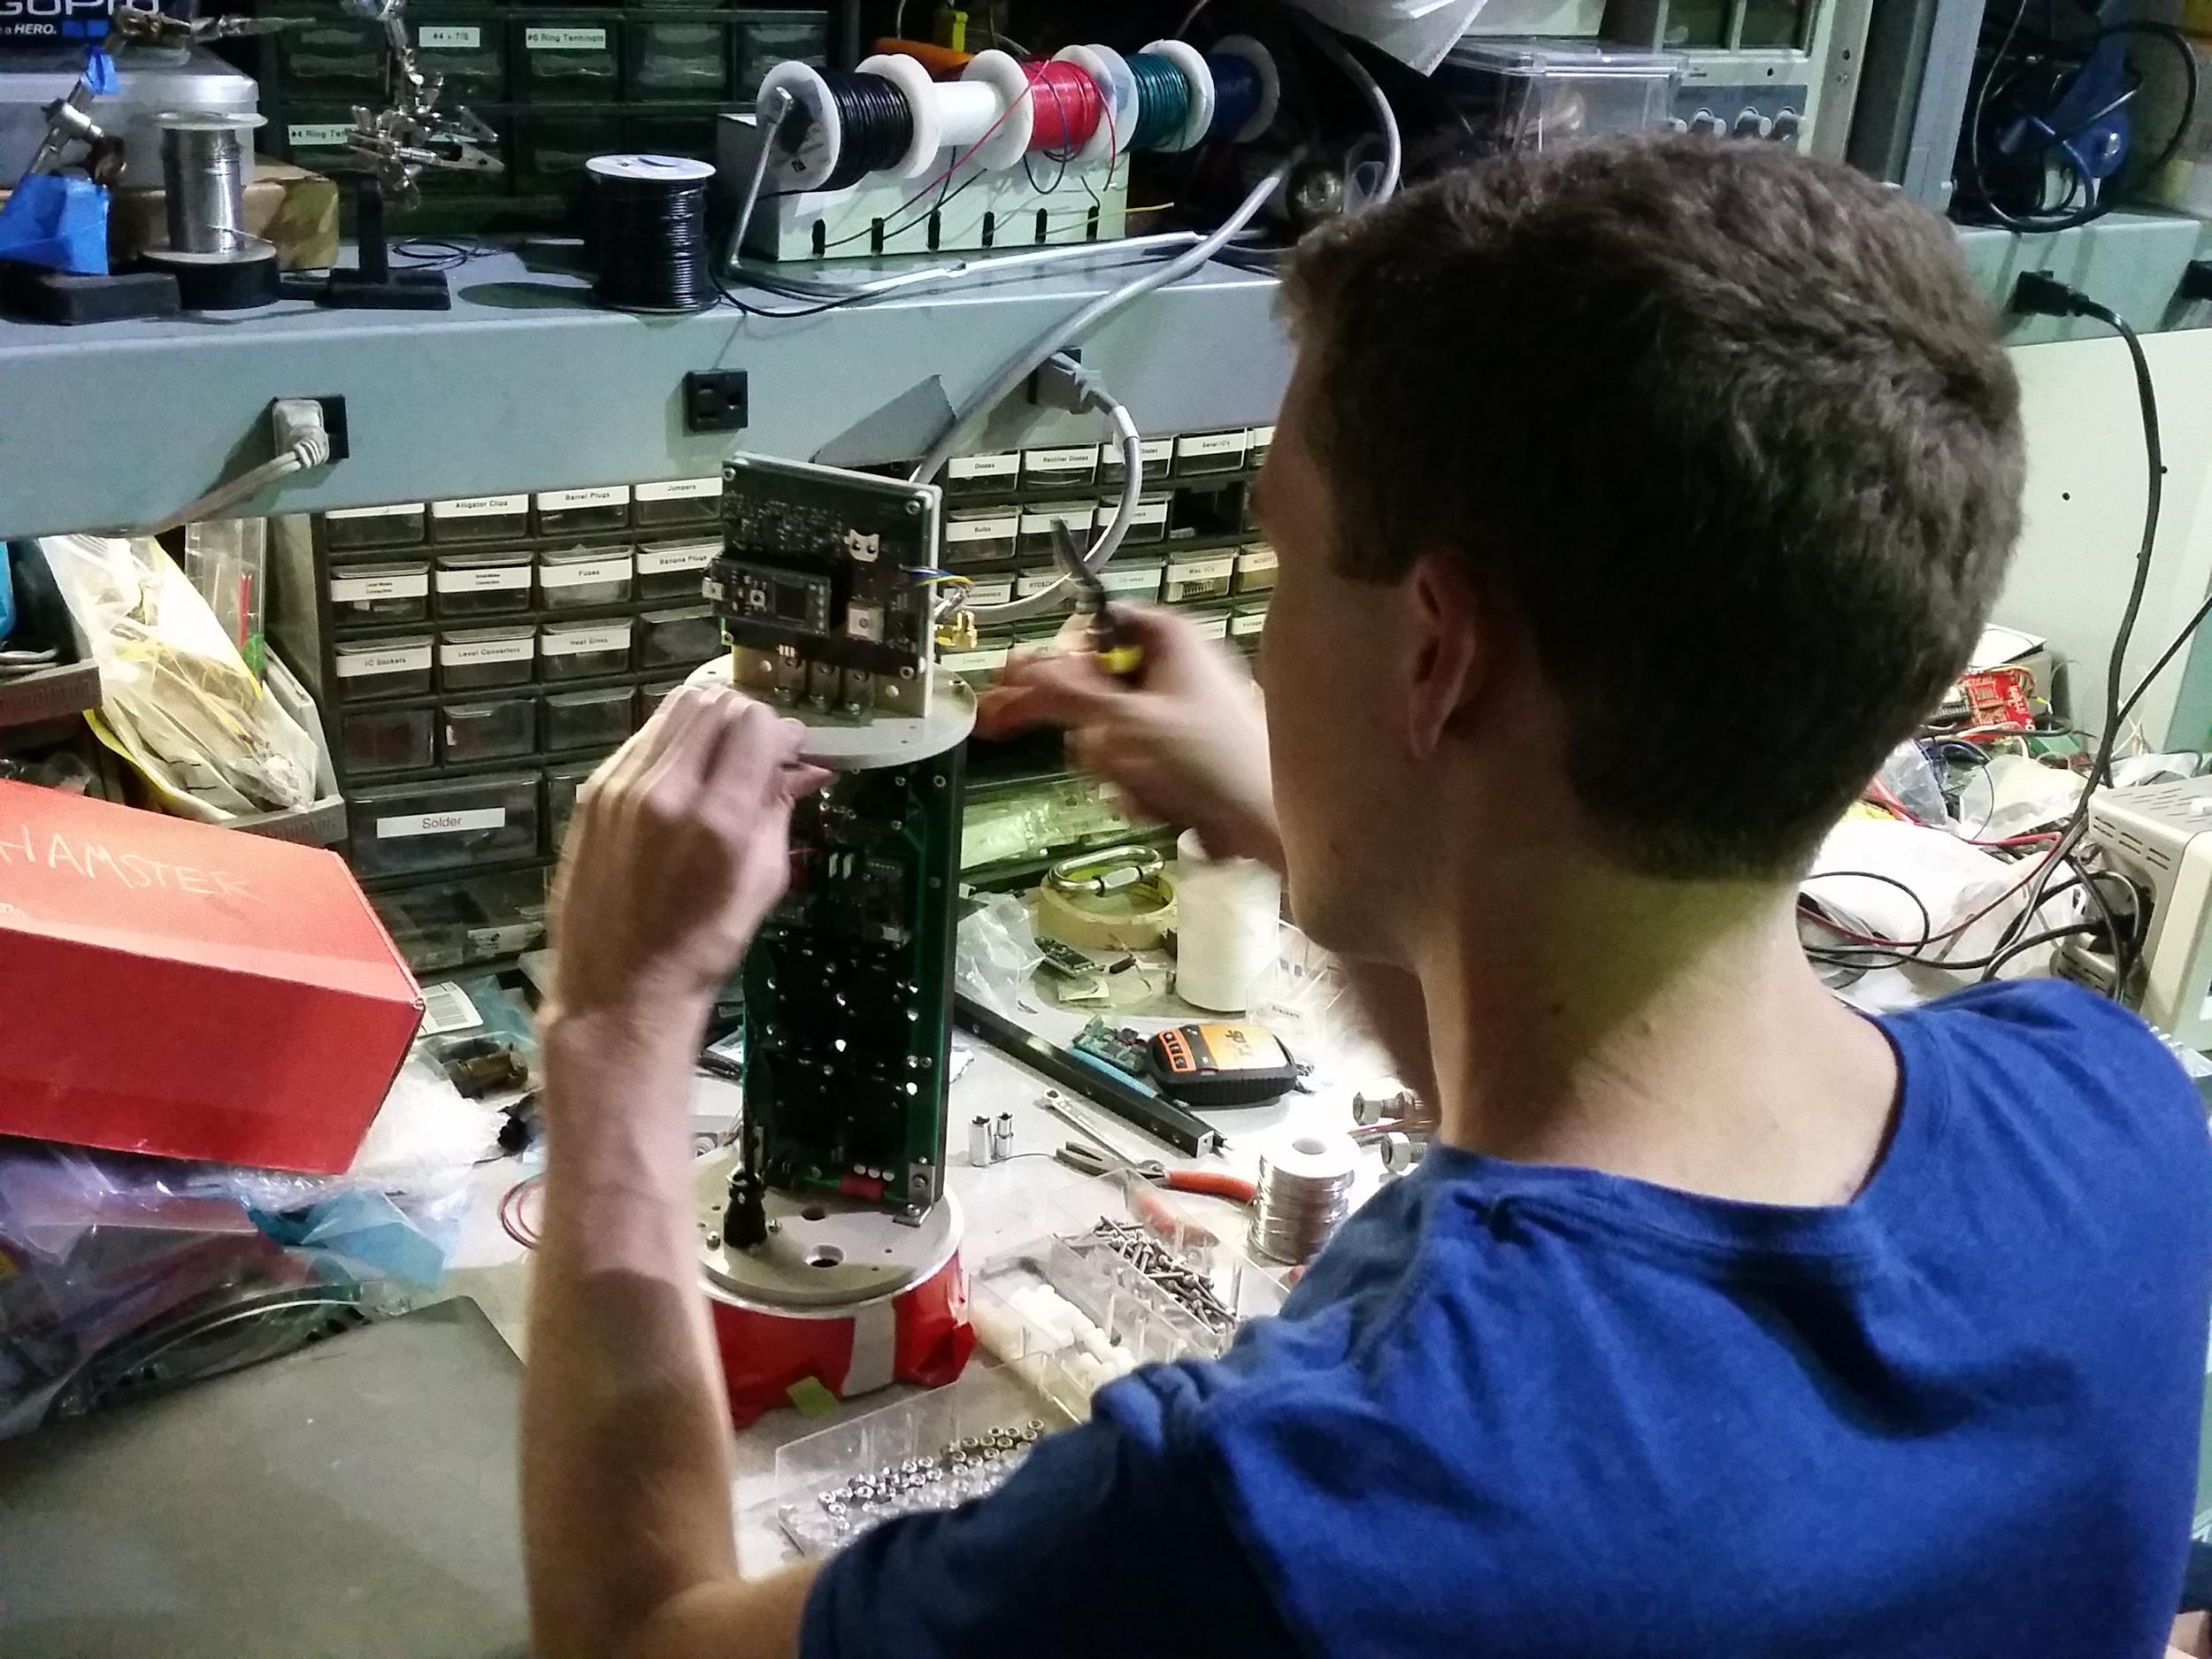 Carter assembling the avionics cartridge for flight